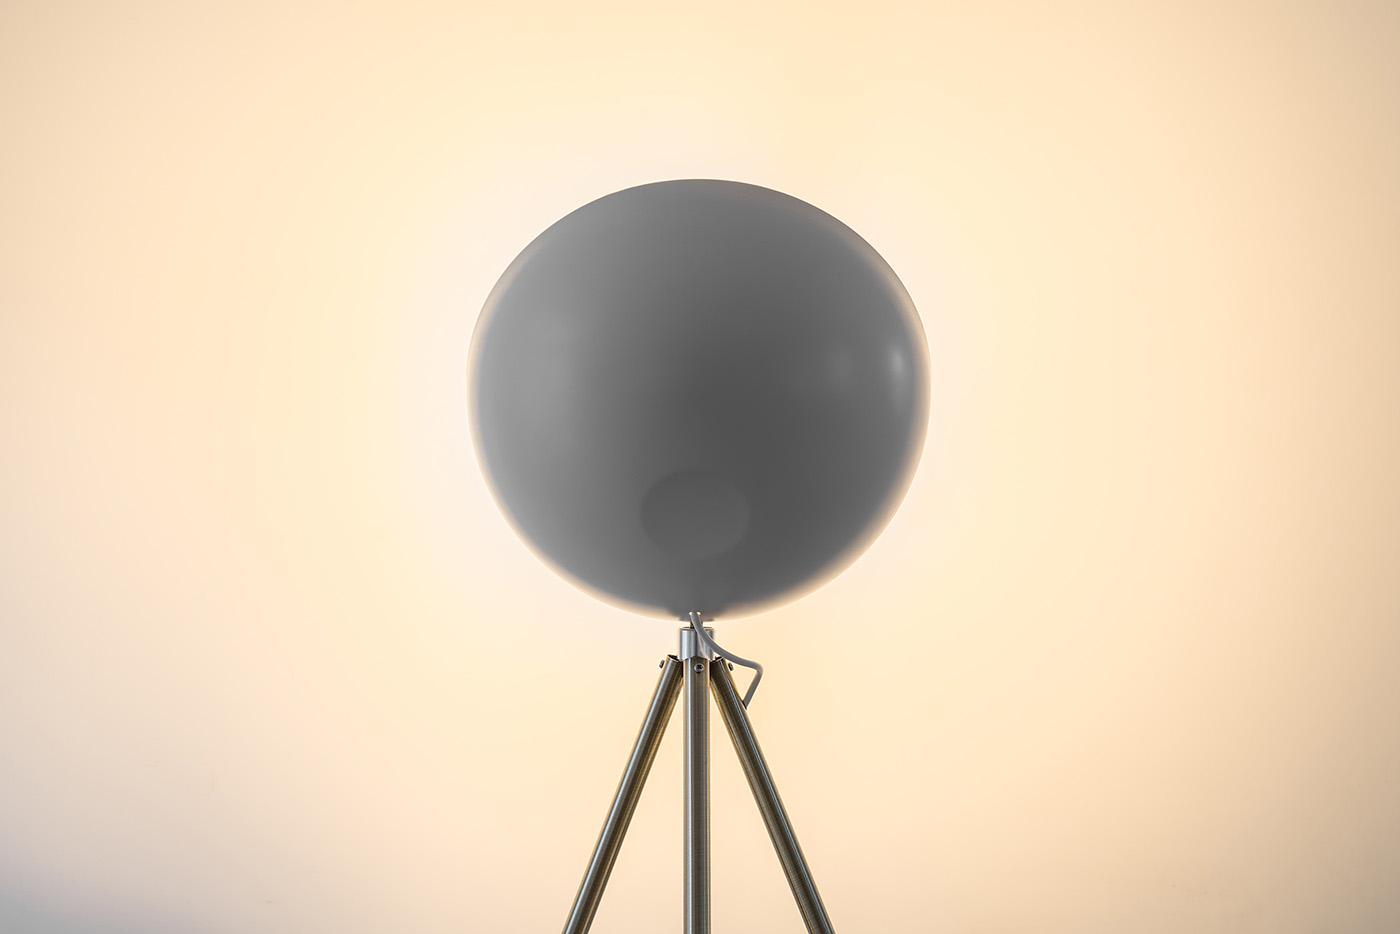 product concept design prototype industrial floor lamp Lamp LOFT model furniture